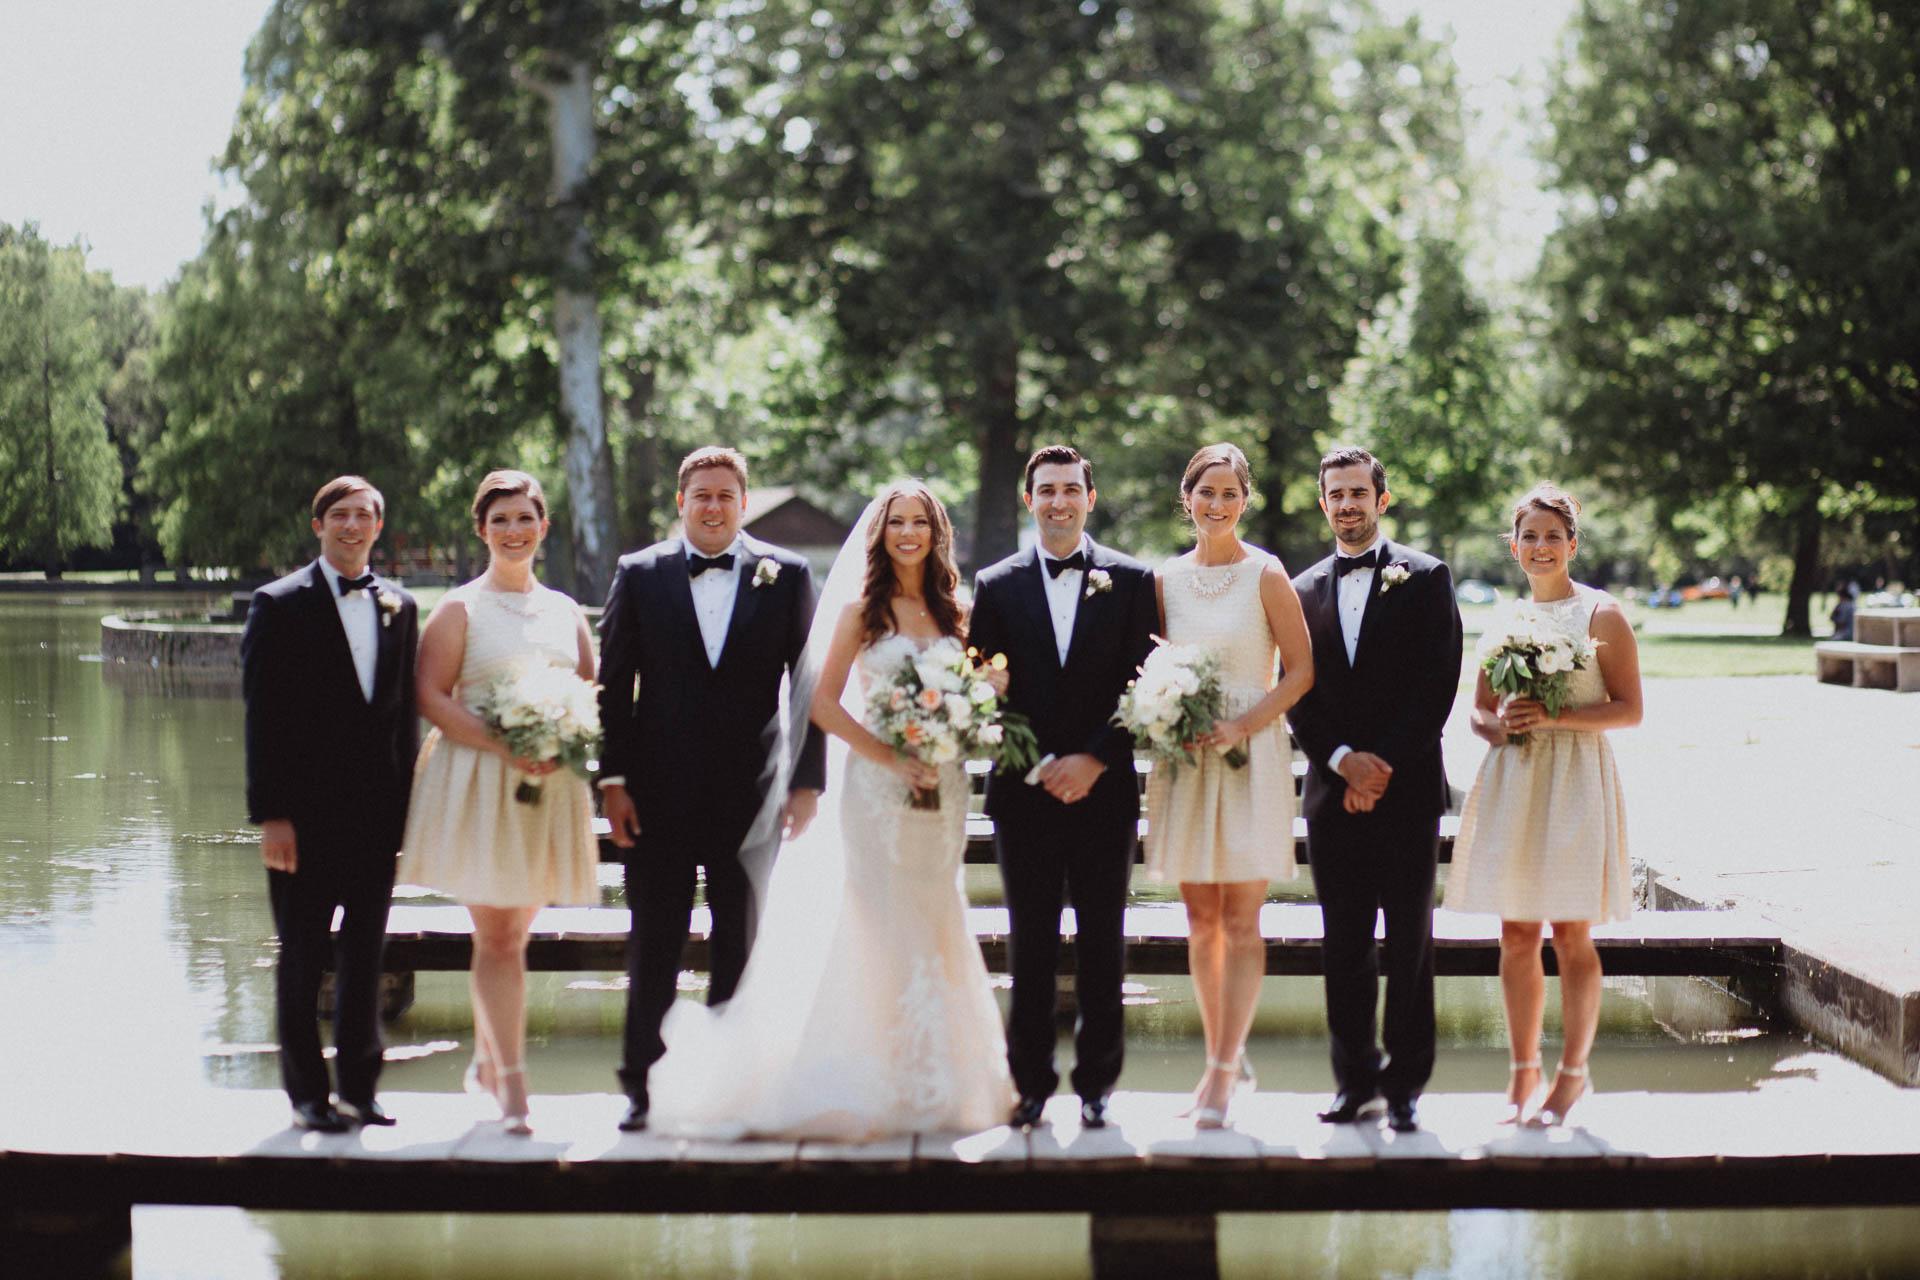 Keri-Joseph-Top-of-the-Market-Wedding-092@2x.jpg